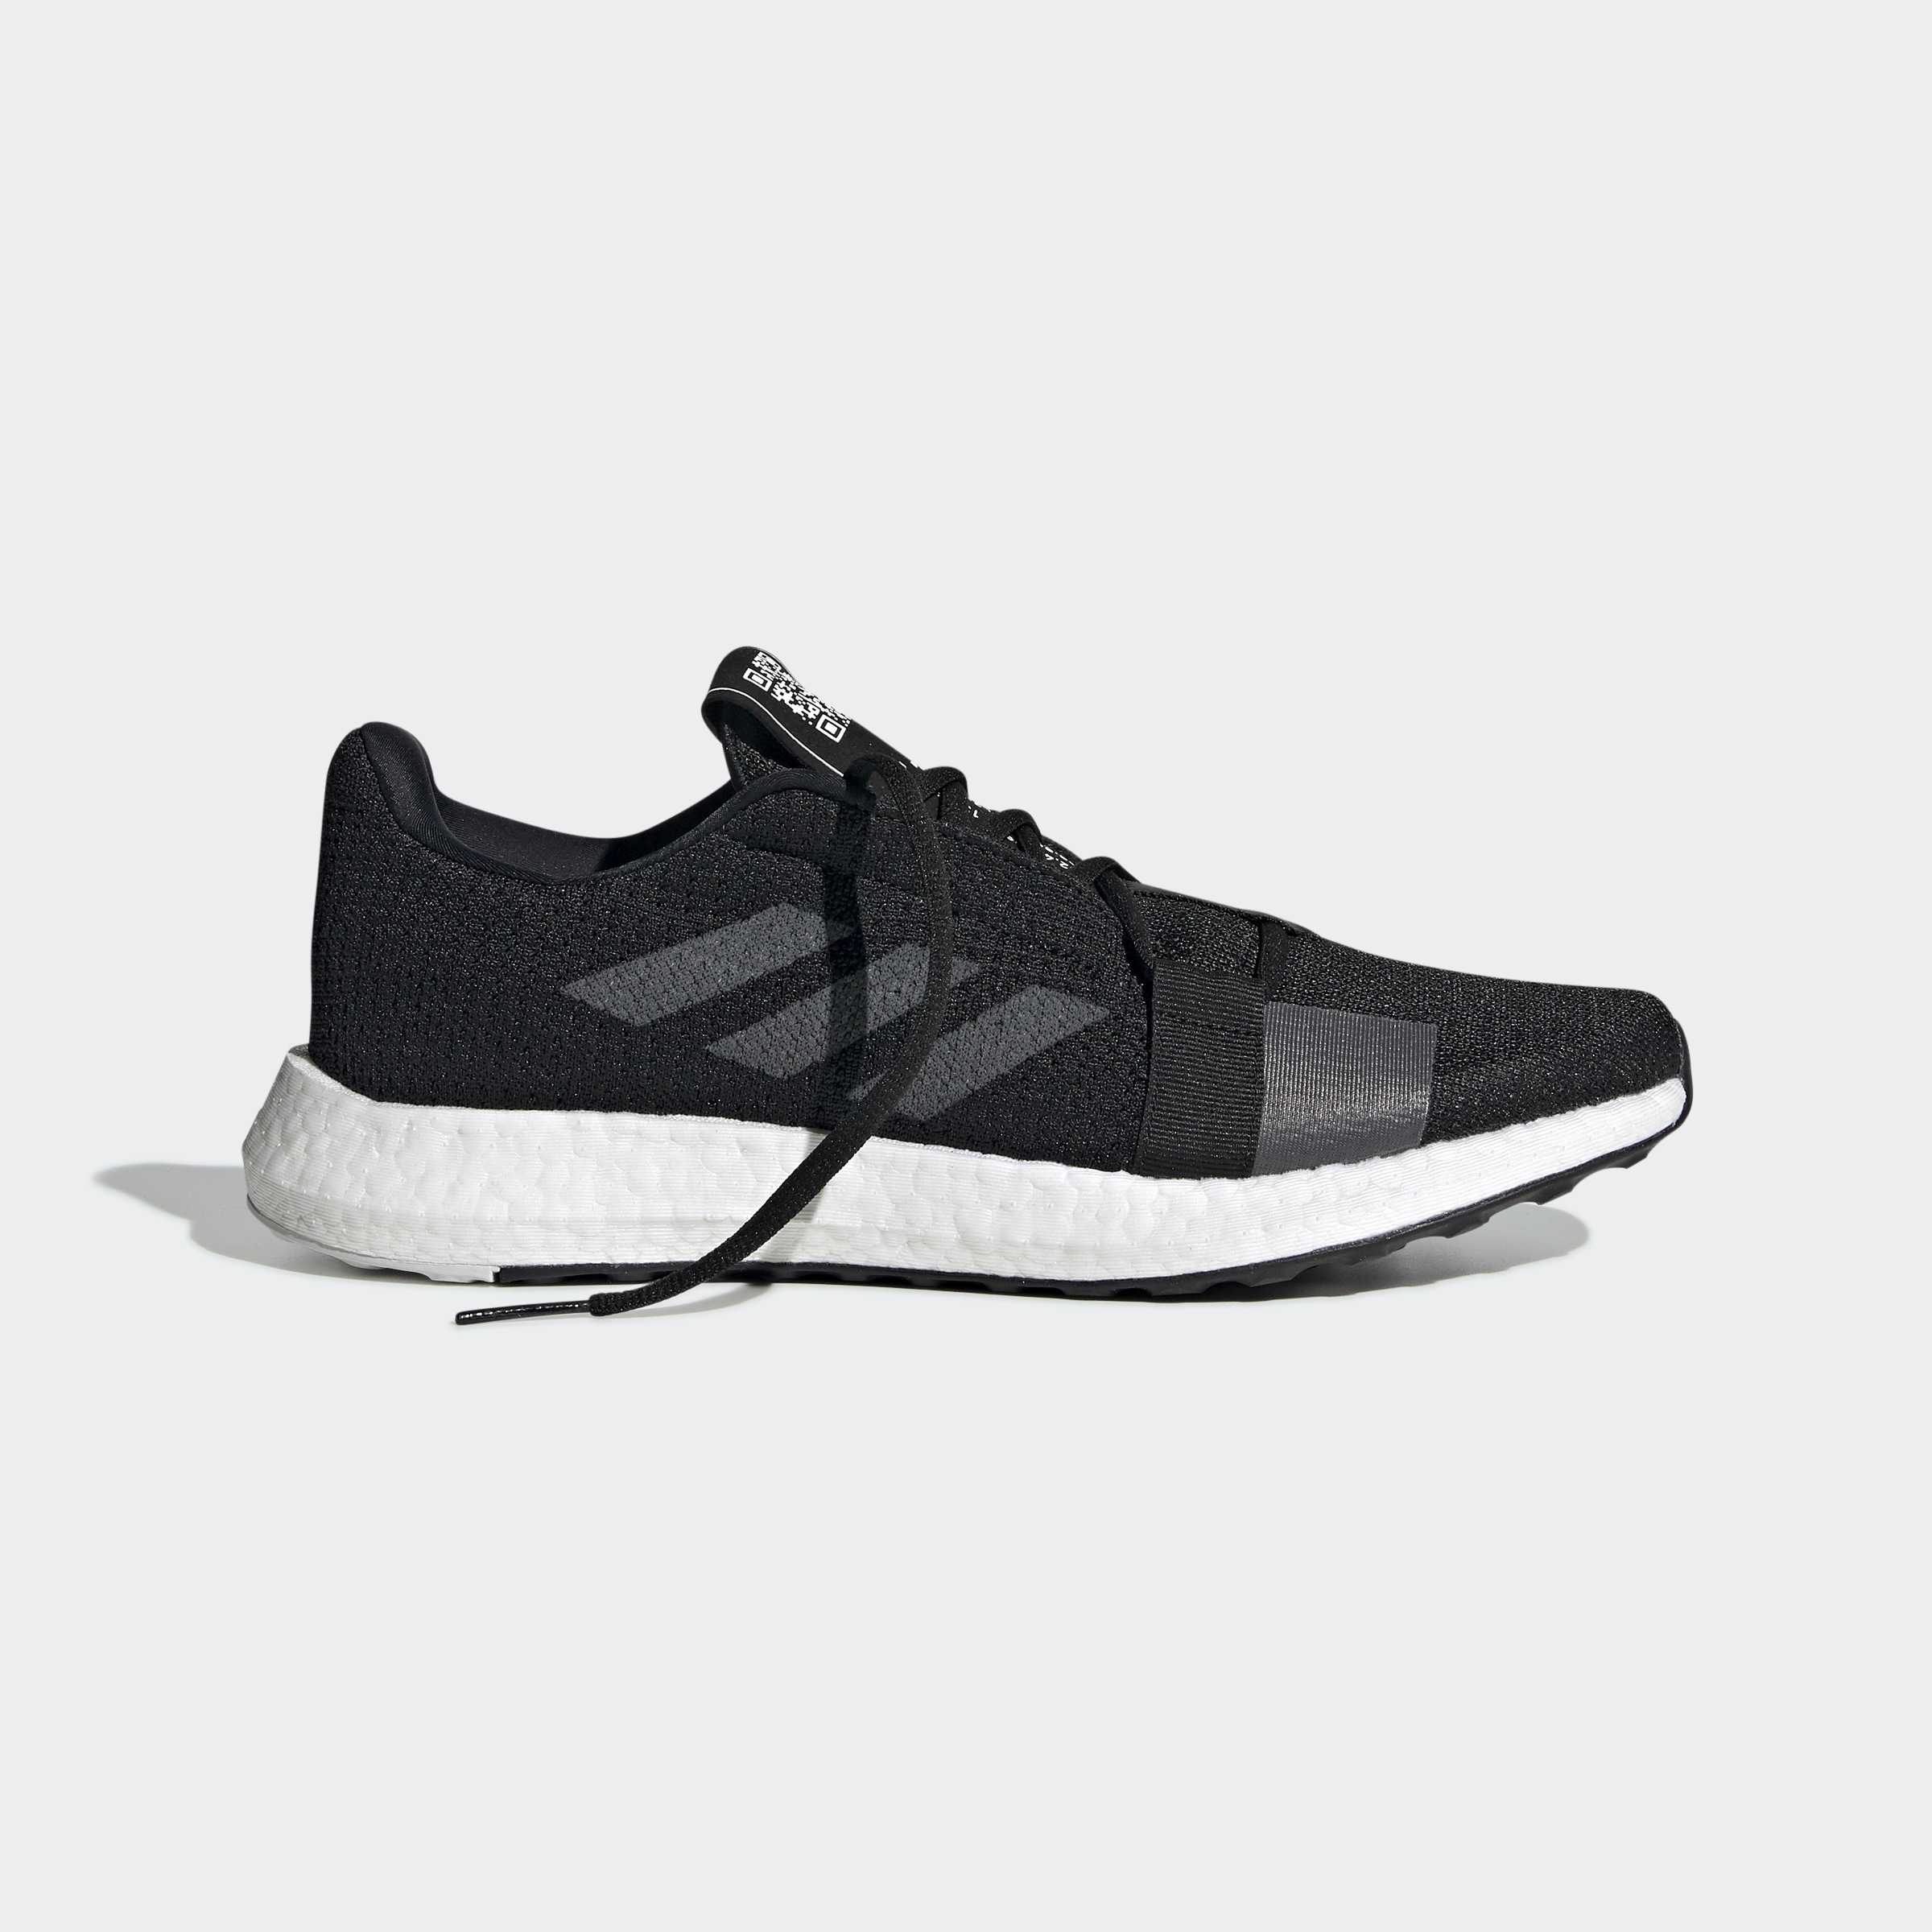 miniature 27 - adidas Senseboost Go Shoes Men's Athletic & Sneakers